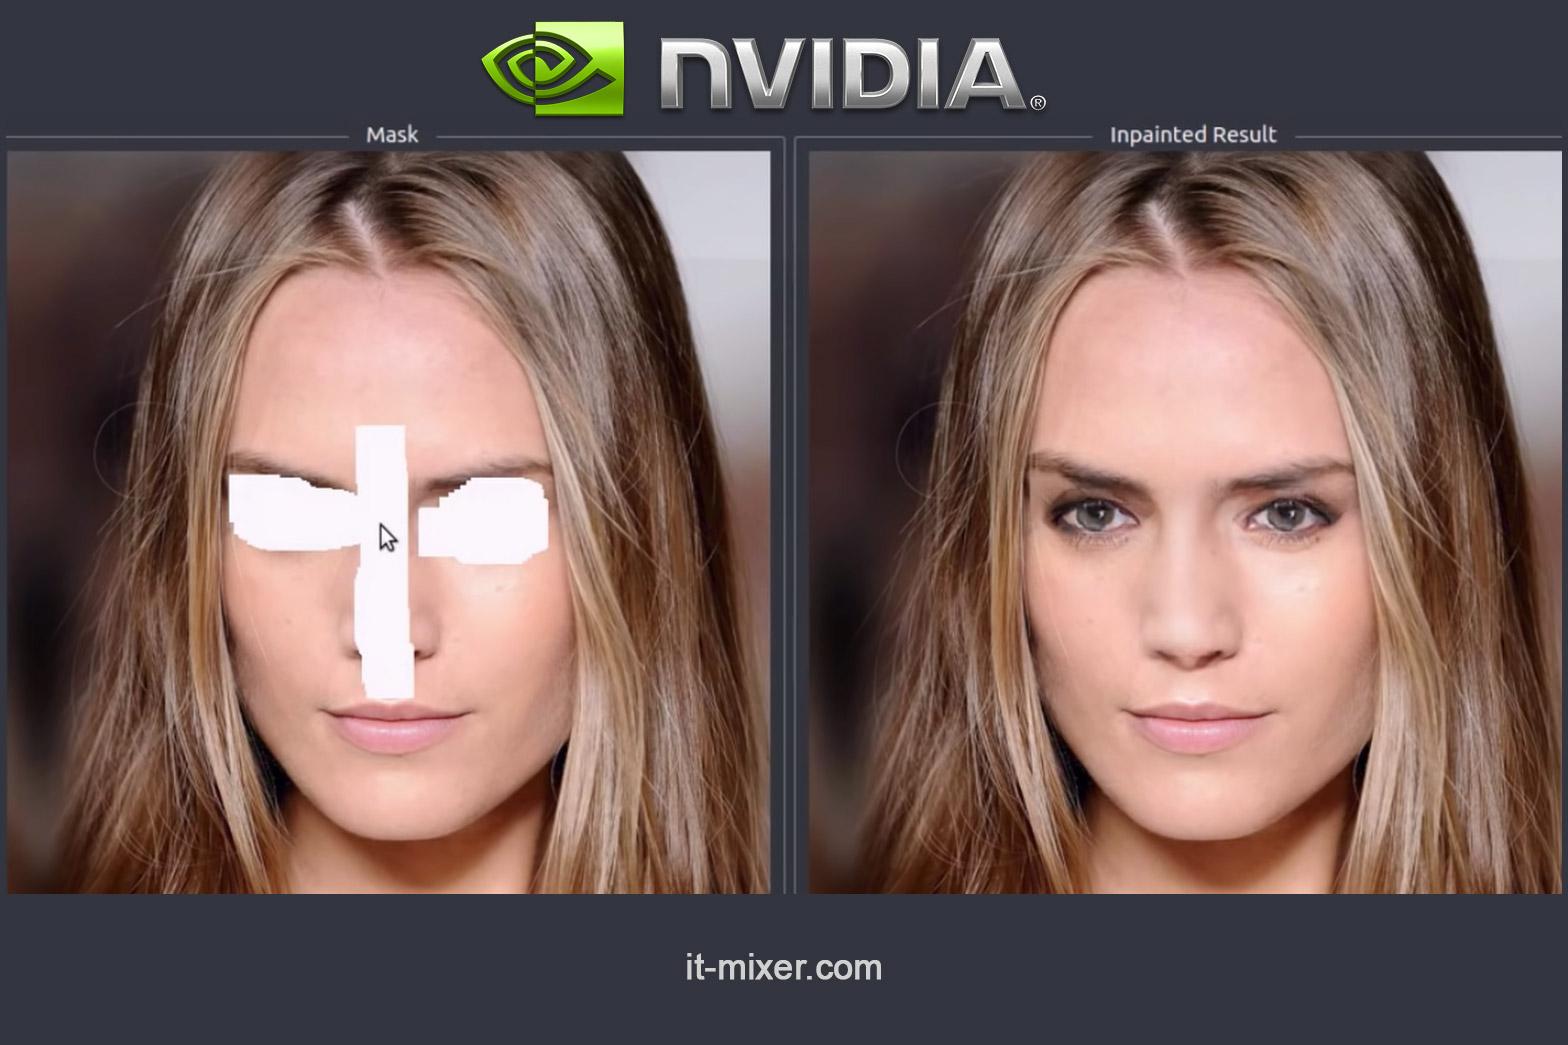 Nvidia AI rekonstrukcija fotografije